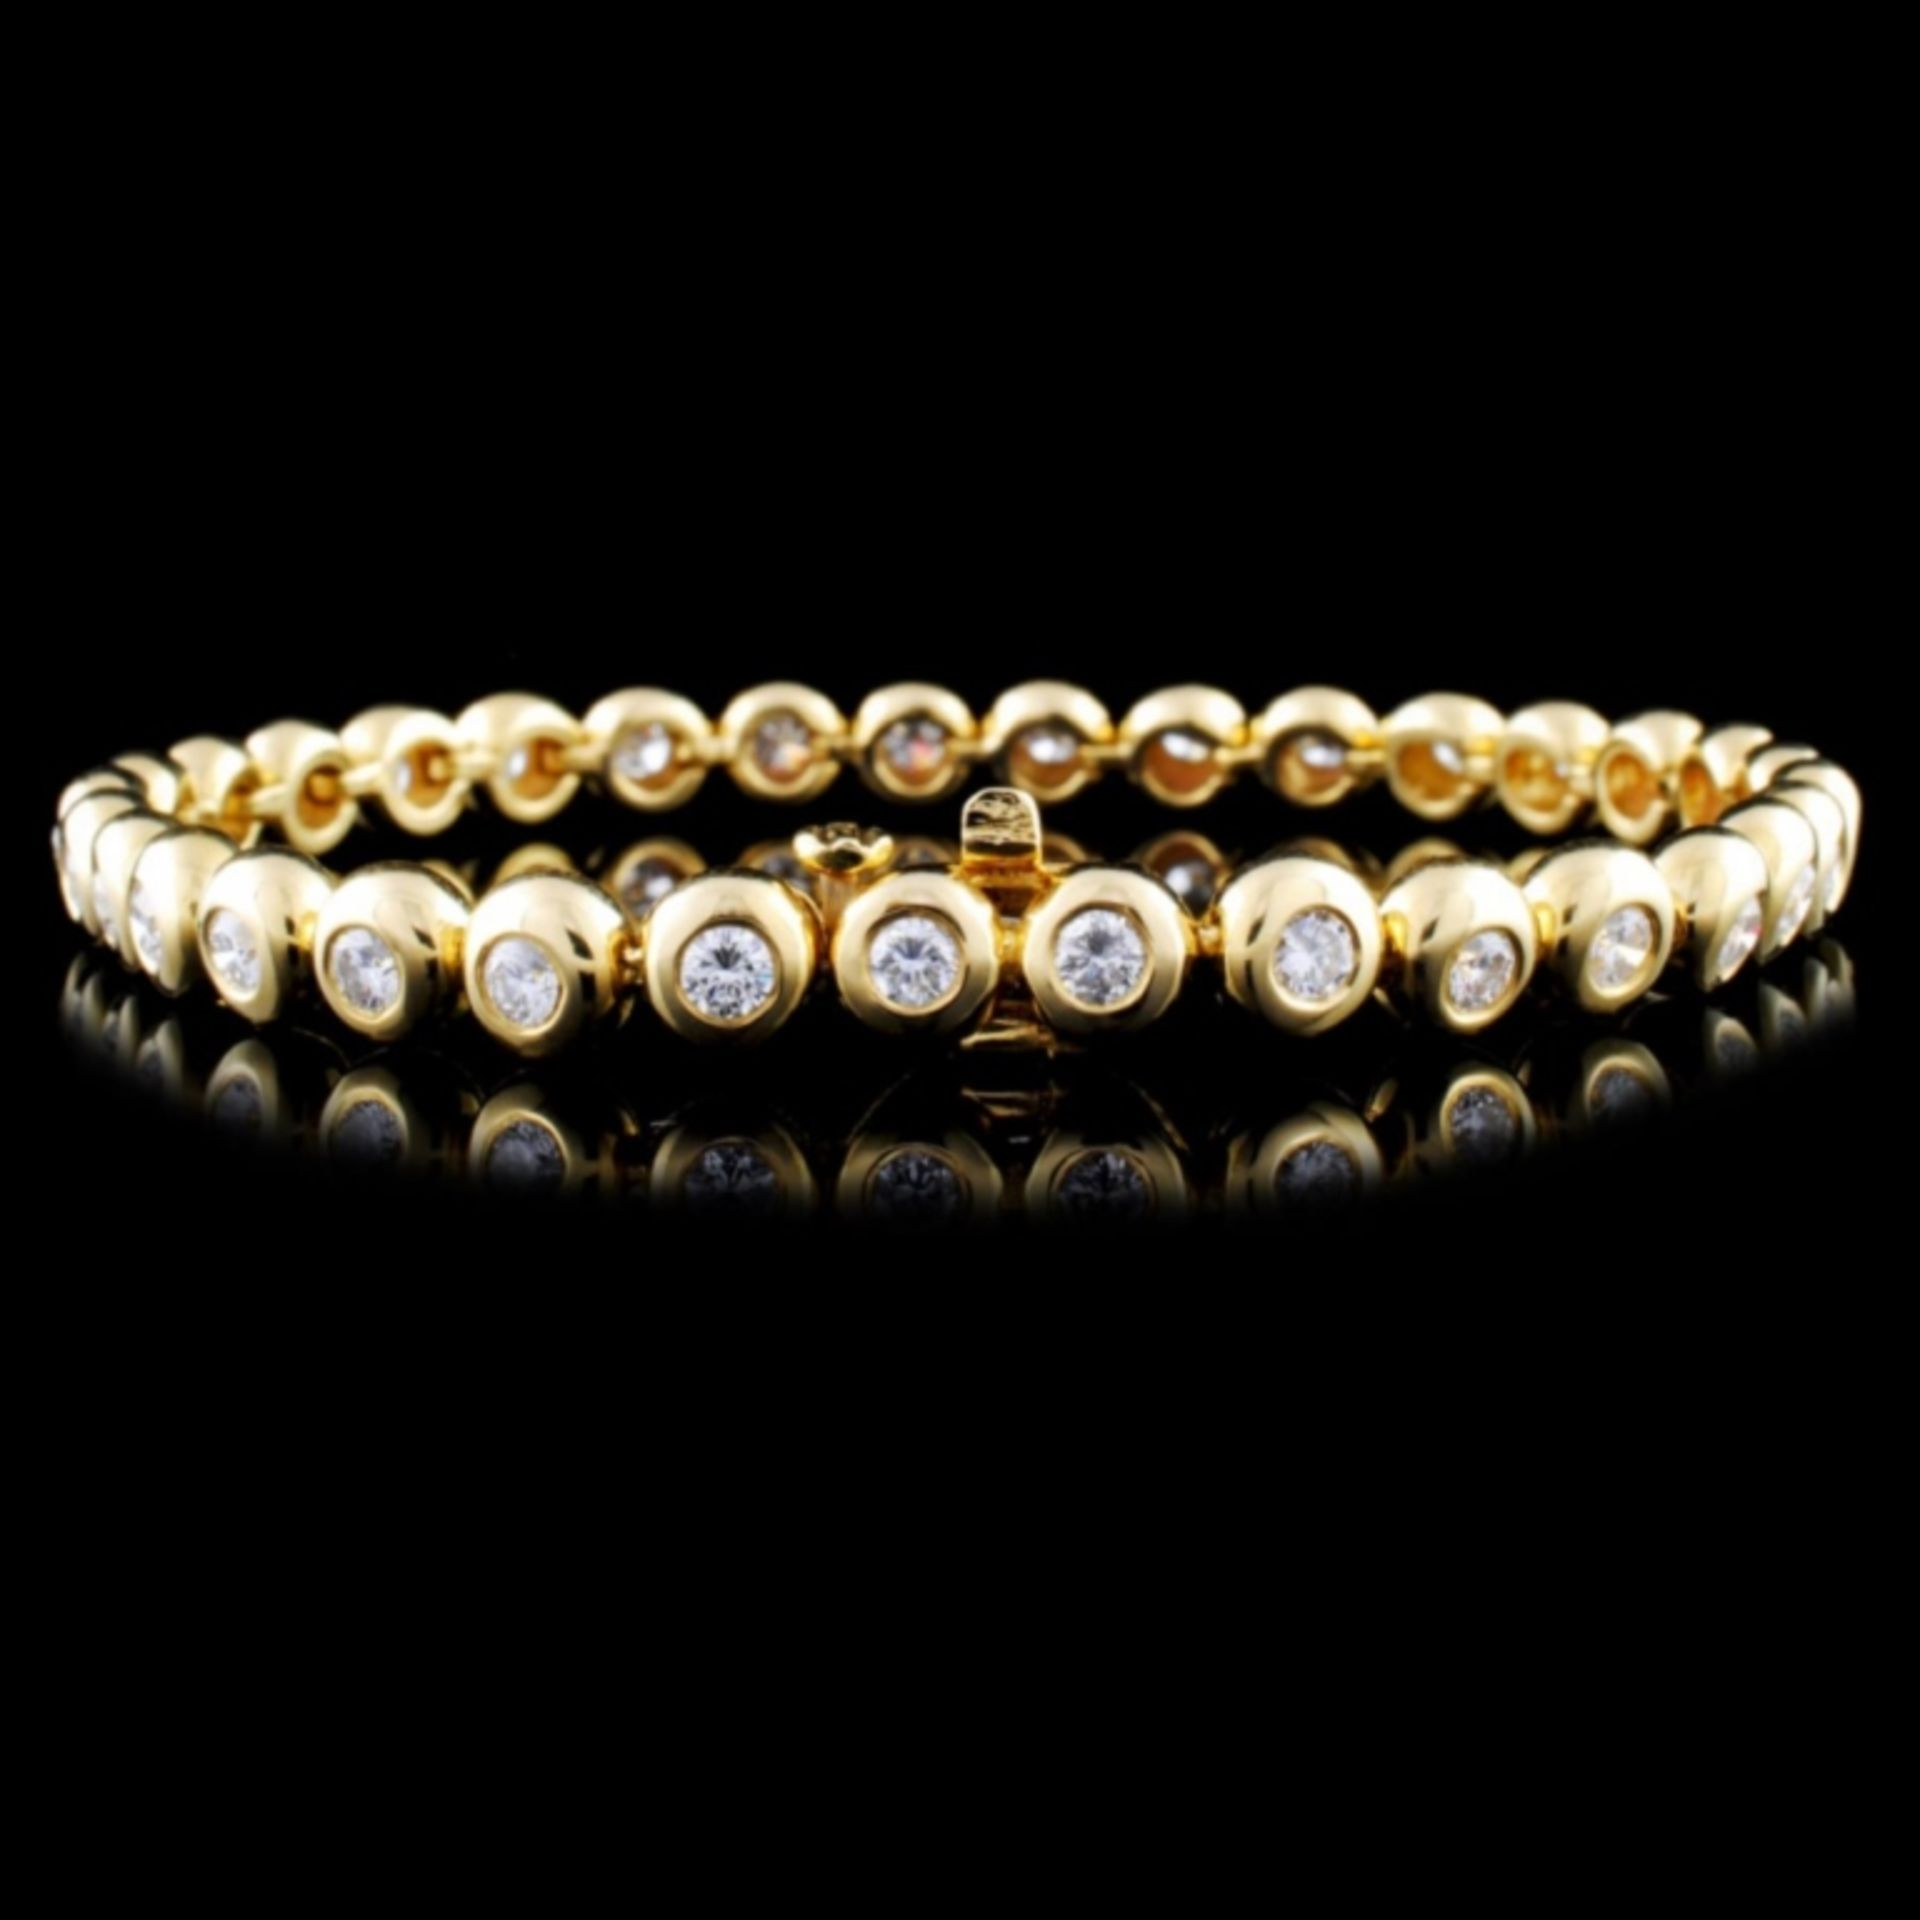 18K Gold 2.67ctw Diamond Bracelet - Image 2 of 2